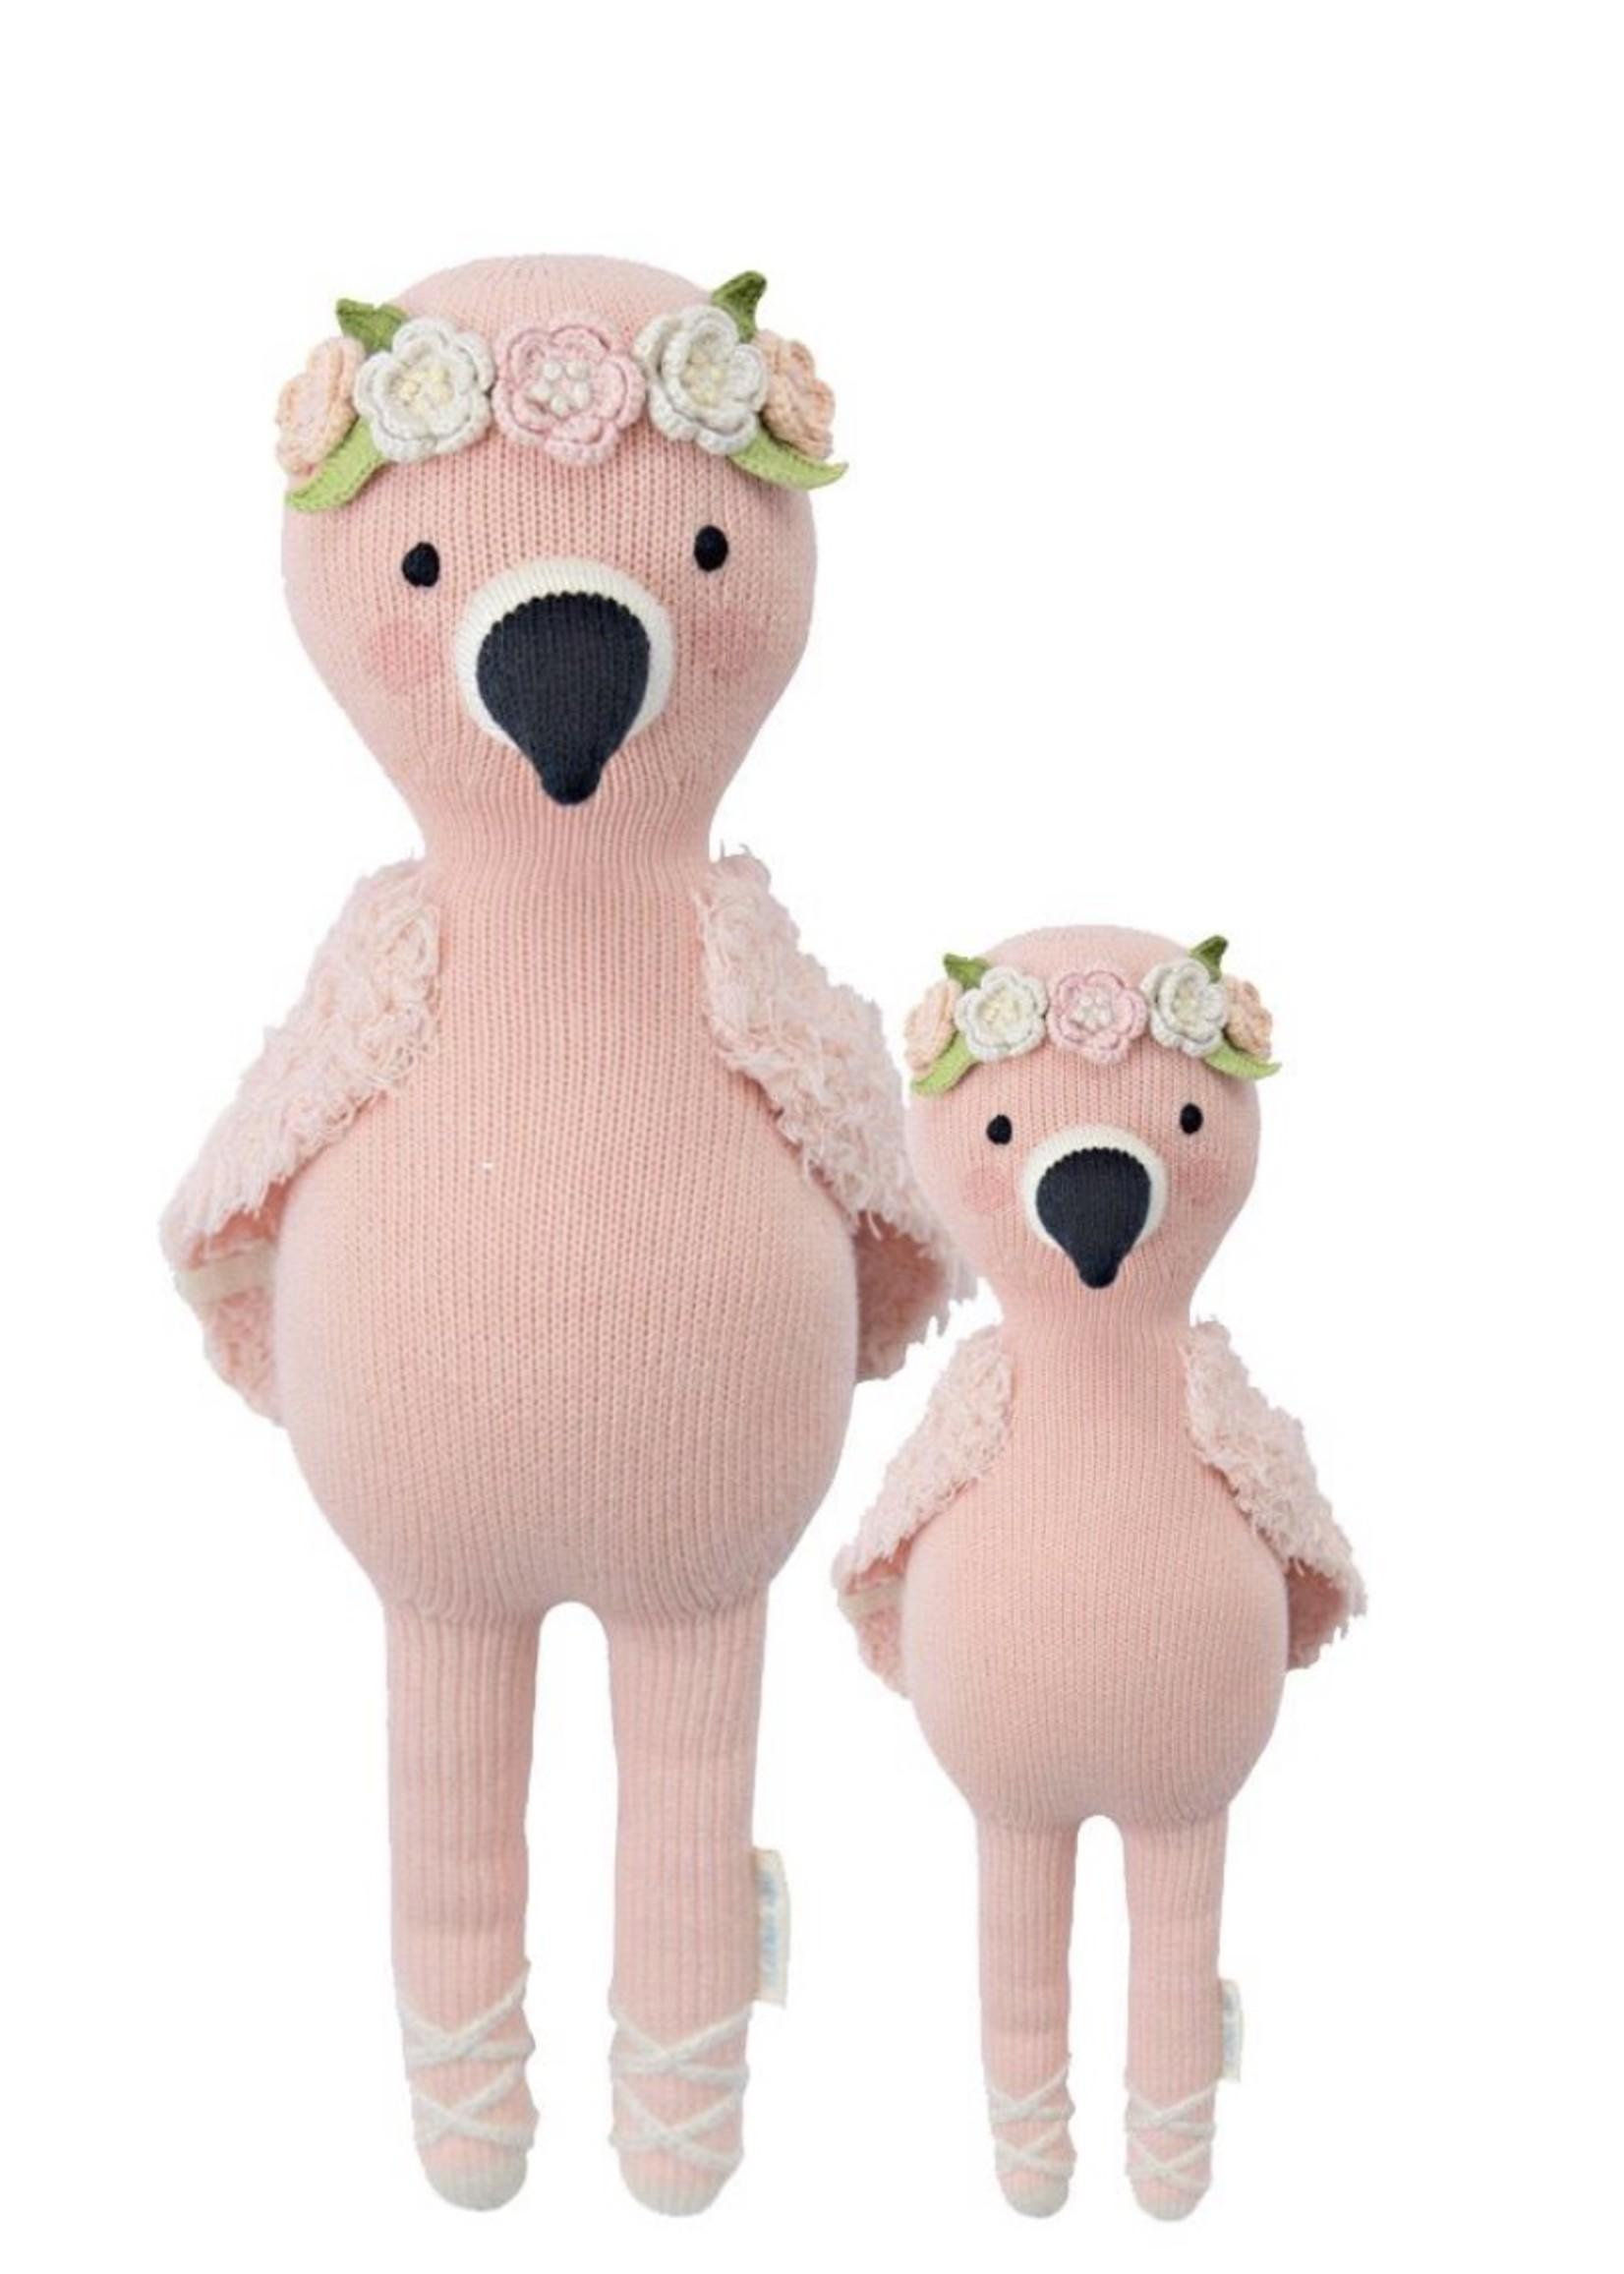 cuddle + kind Mini Flamingo Knit Doll PENELOPE